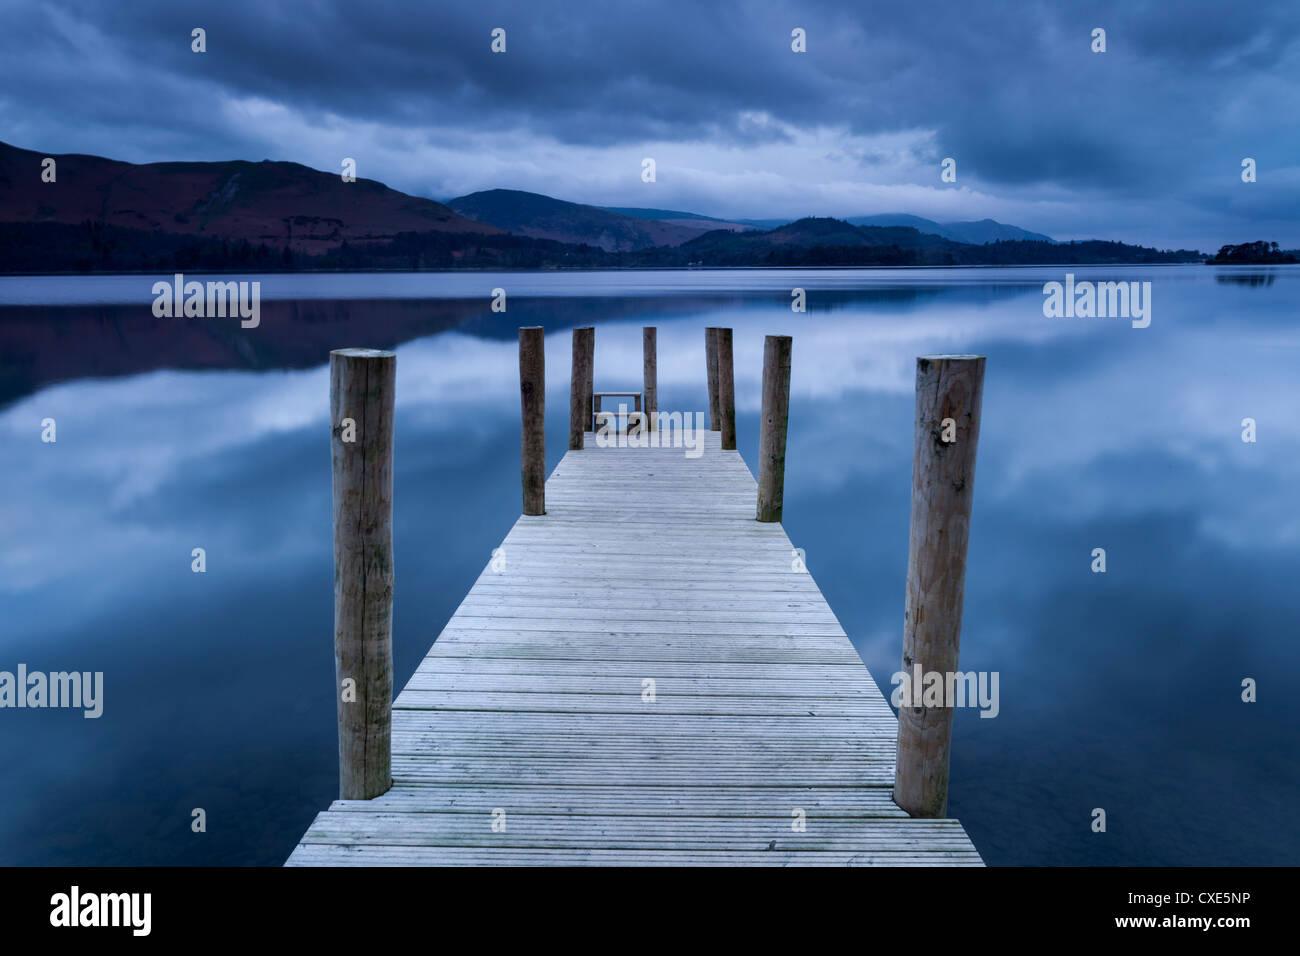 Amanecer en Ashness embarcadero sobre Derwentwater, Keswick, Lake District National Park, Cumbria, Inglaterra, Reino Imagen De Stock